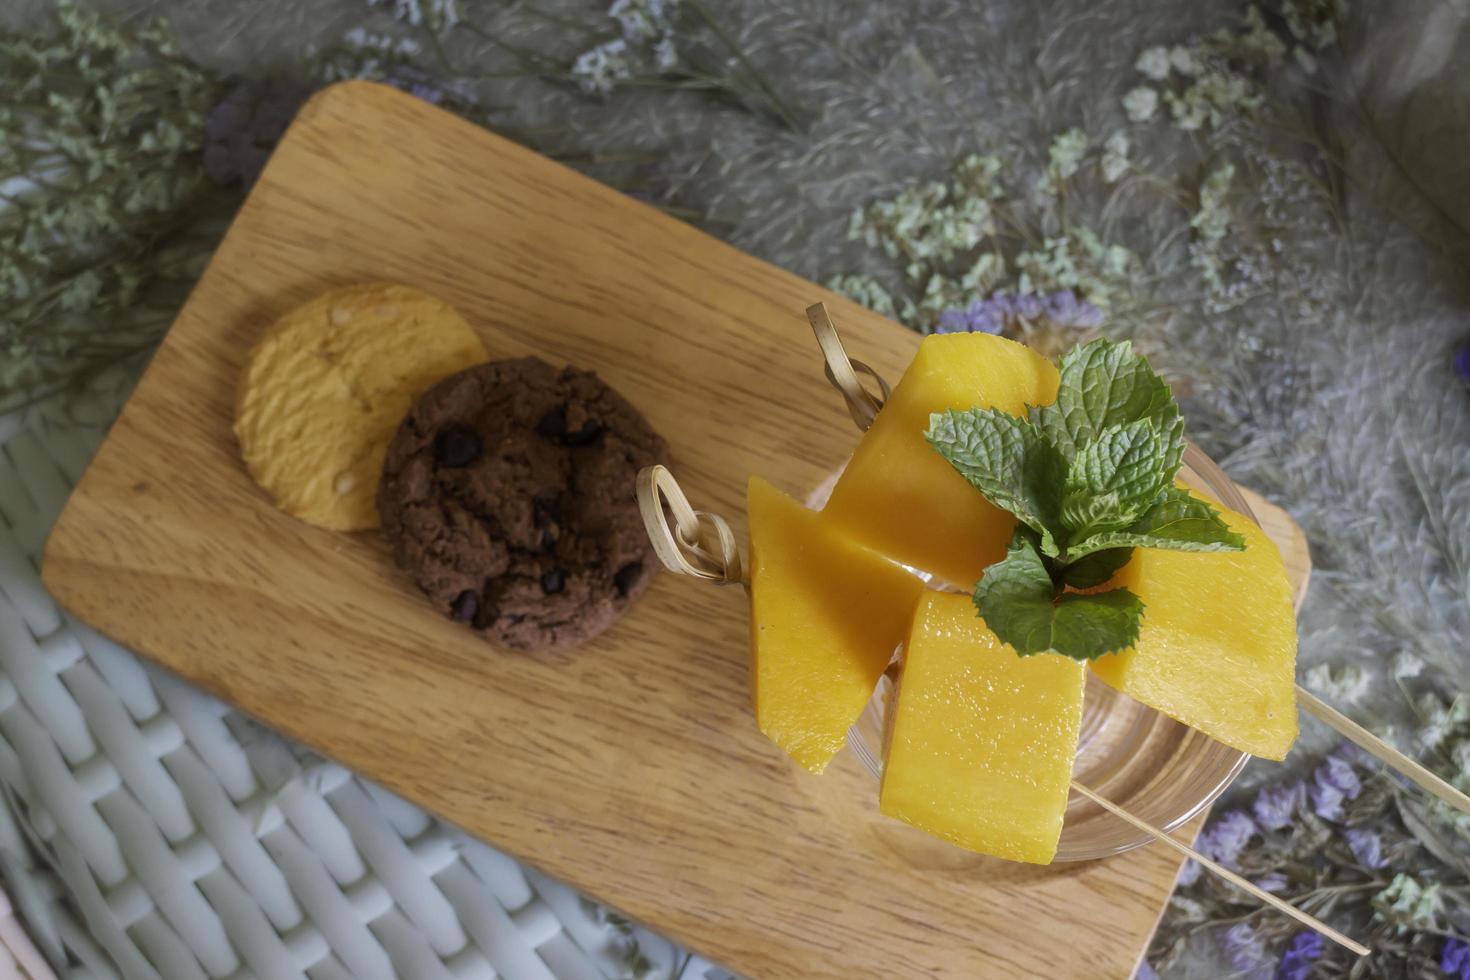 mangue jaune et biscuits photo